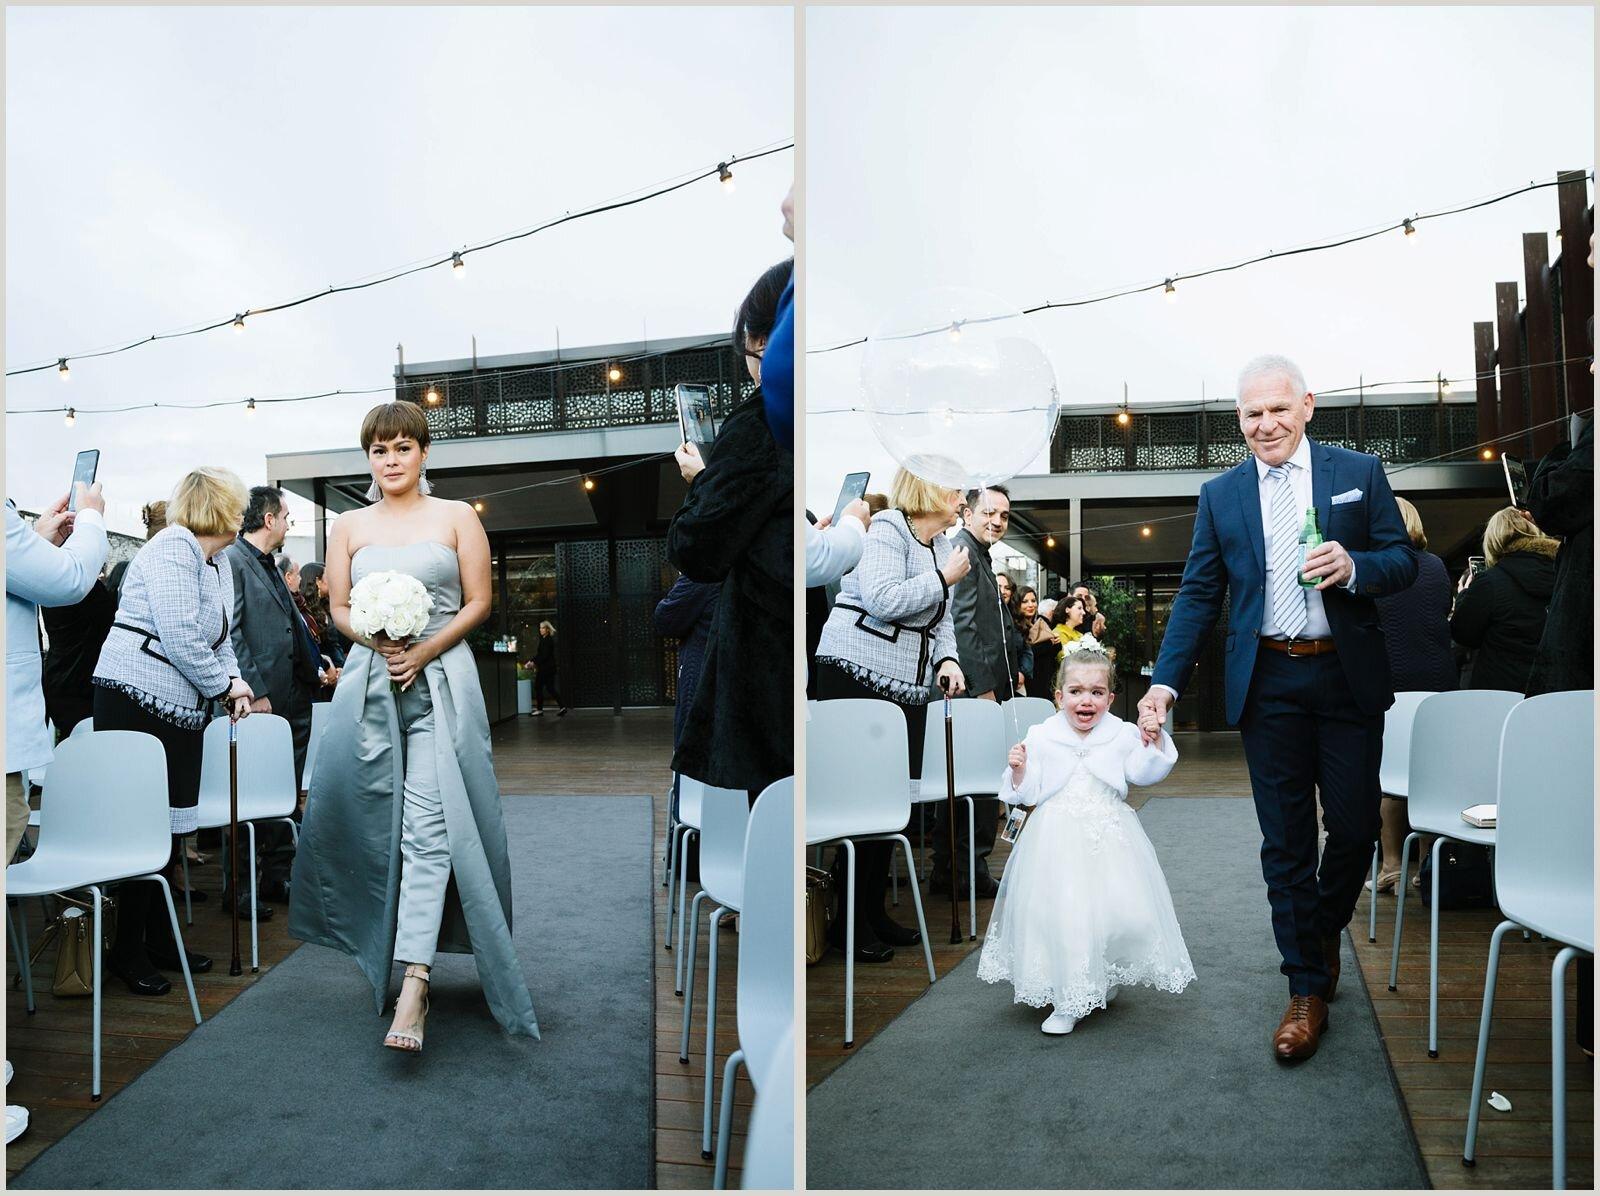 joseph_koprek_wedding_melbourne_the_prince_deck_0049.jpg